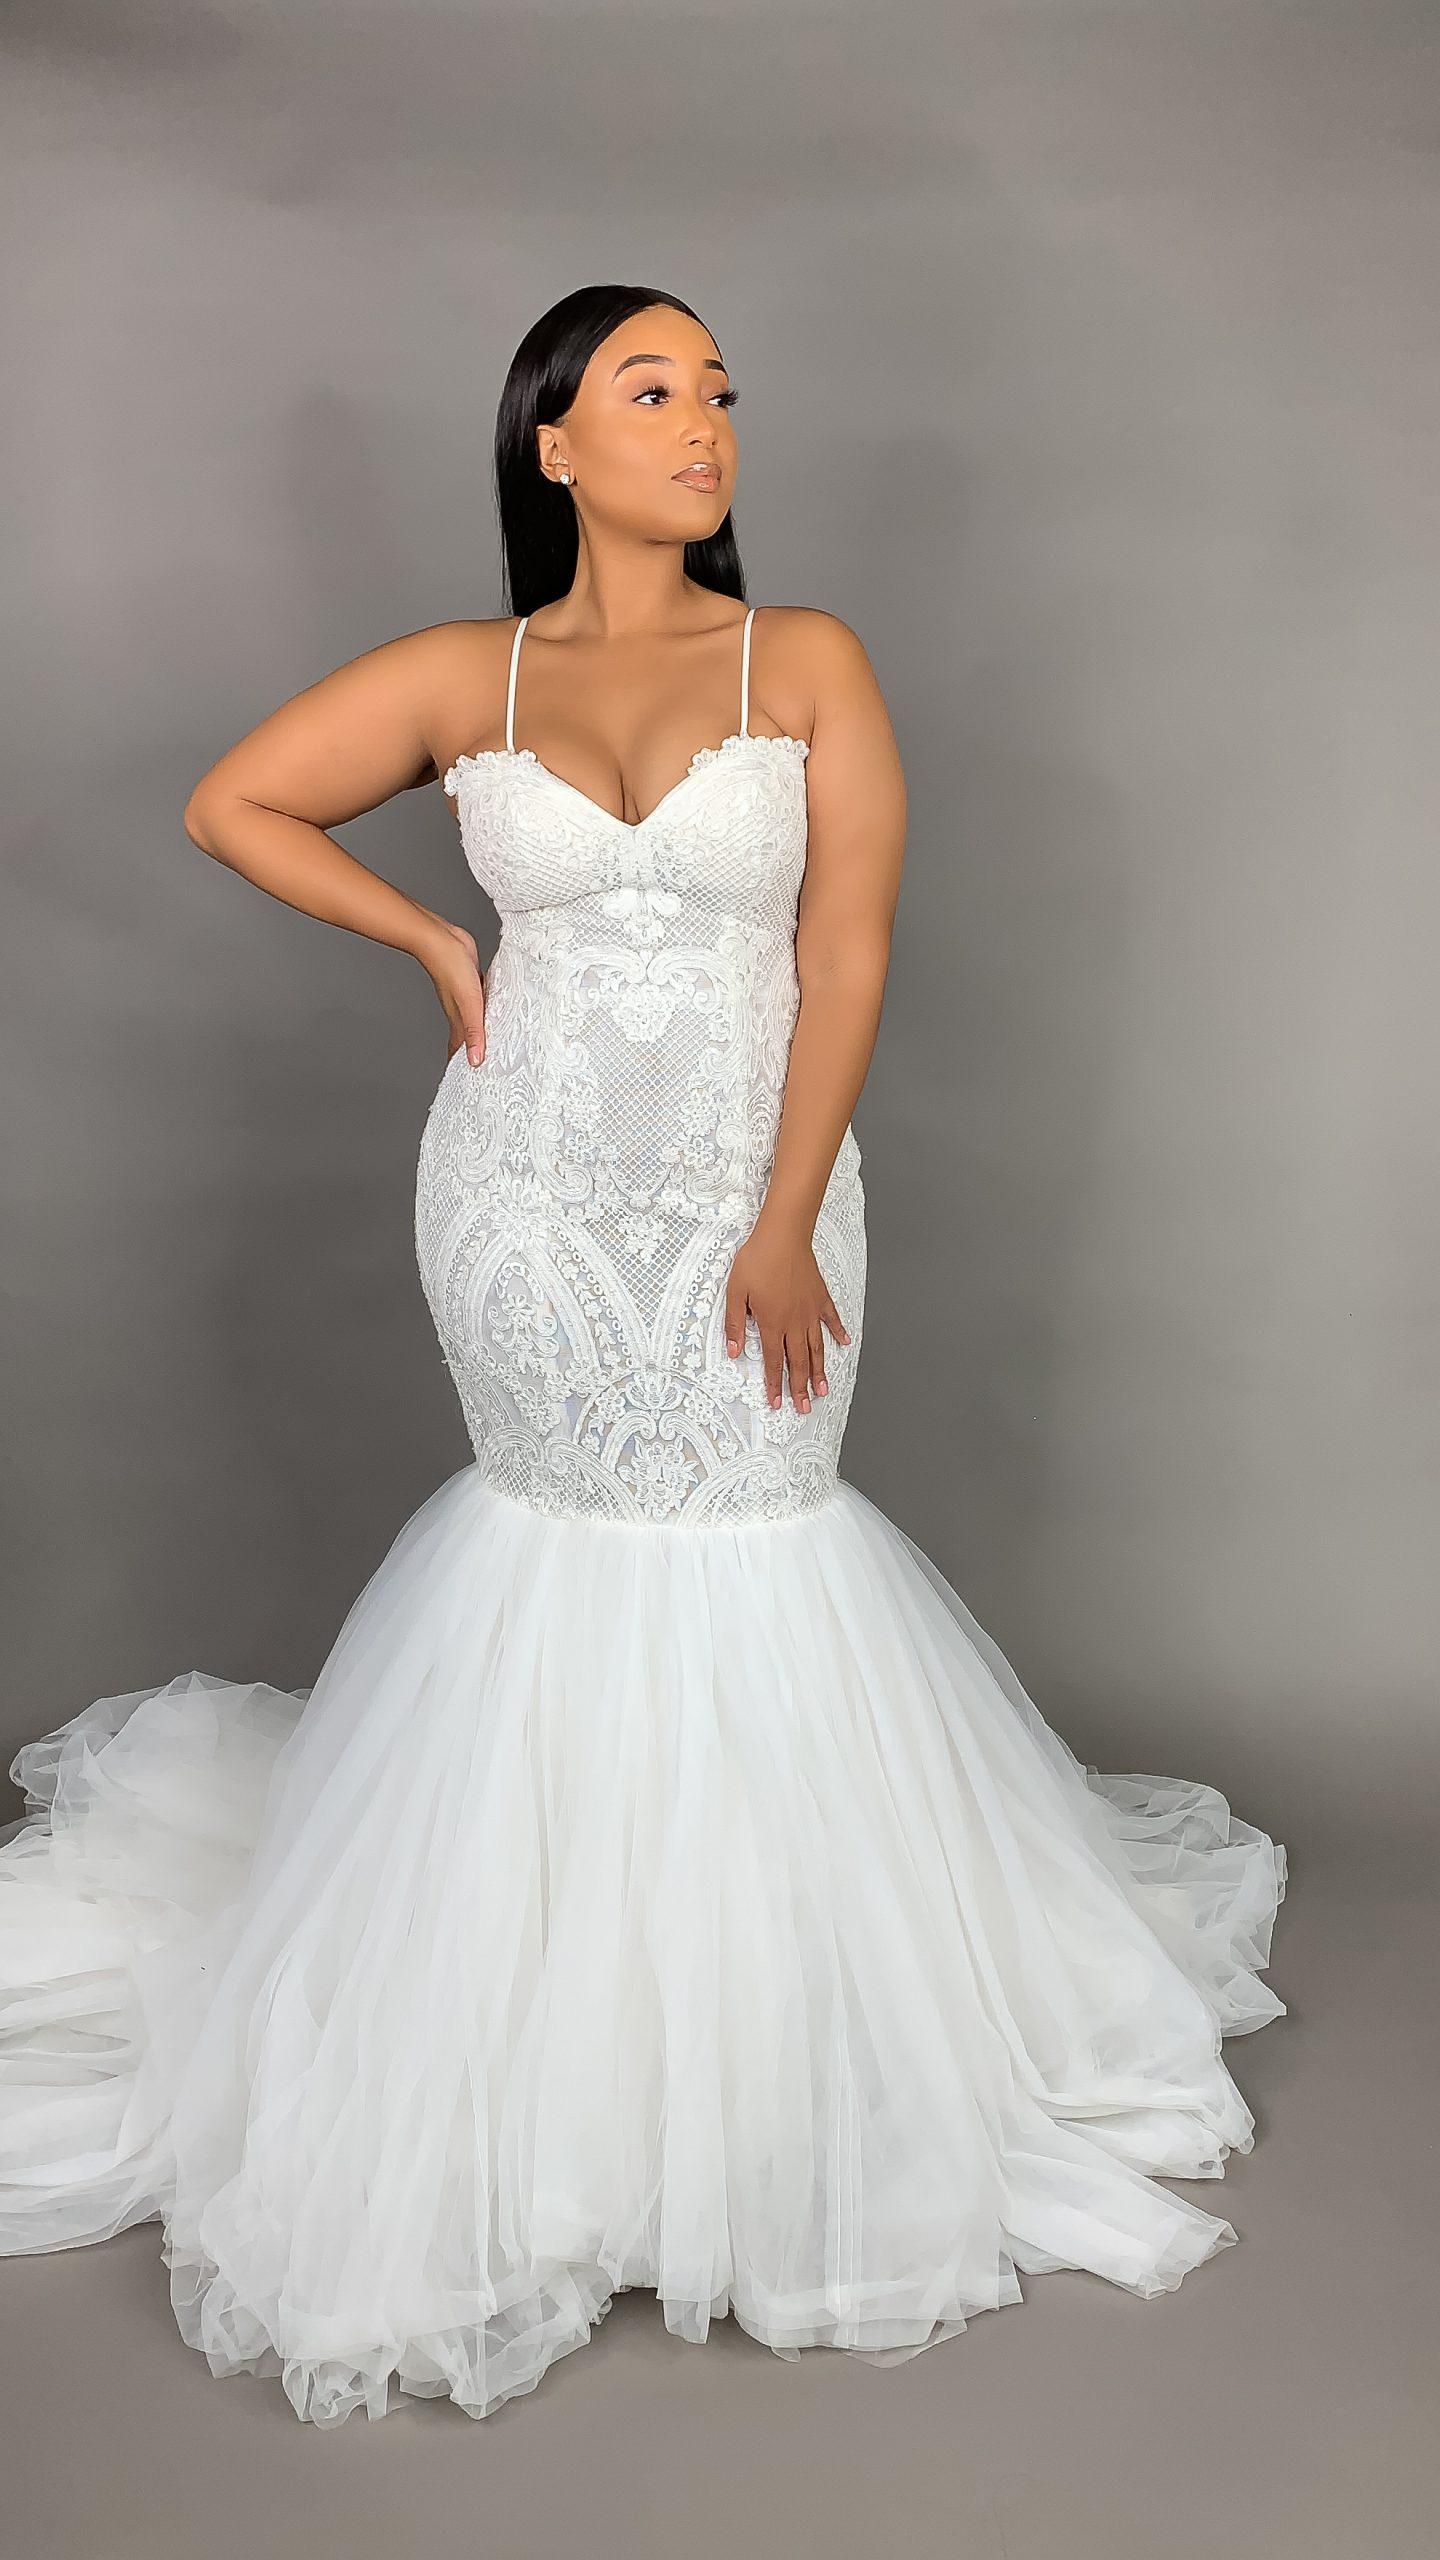 Spaghetti Strap Lace Mermaid Wedding Dress   Kleinfeld Bridal